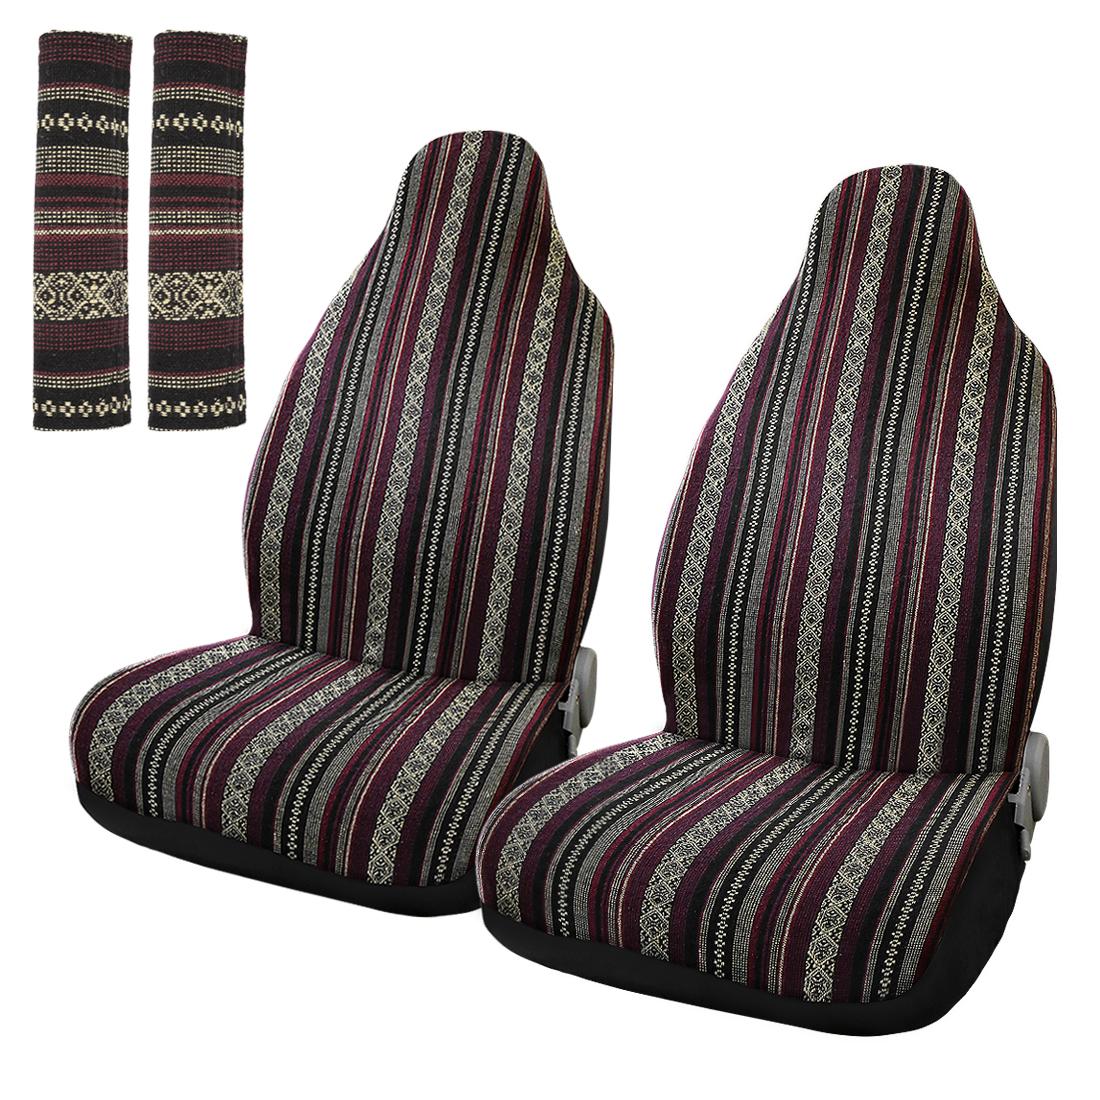 Universal Car Front Seat Cover Saddle Blanket Seat-Belt Pad Protectors 2pcs